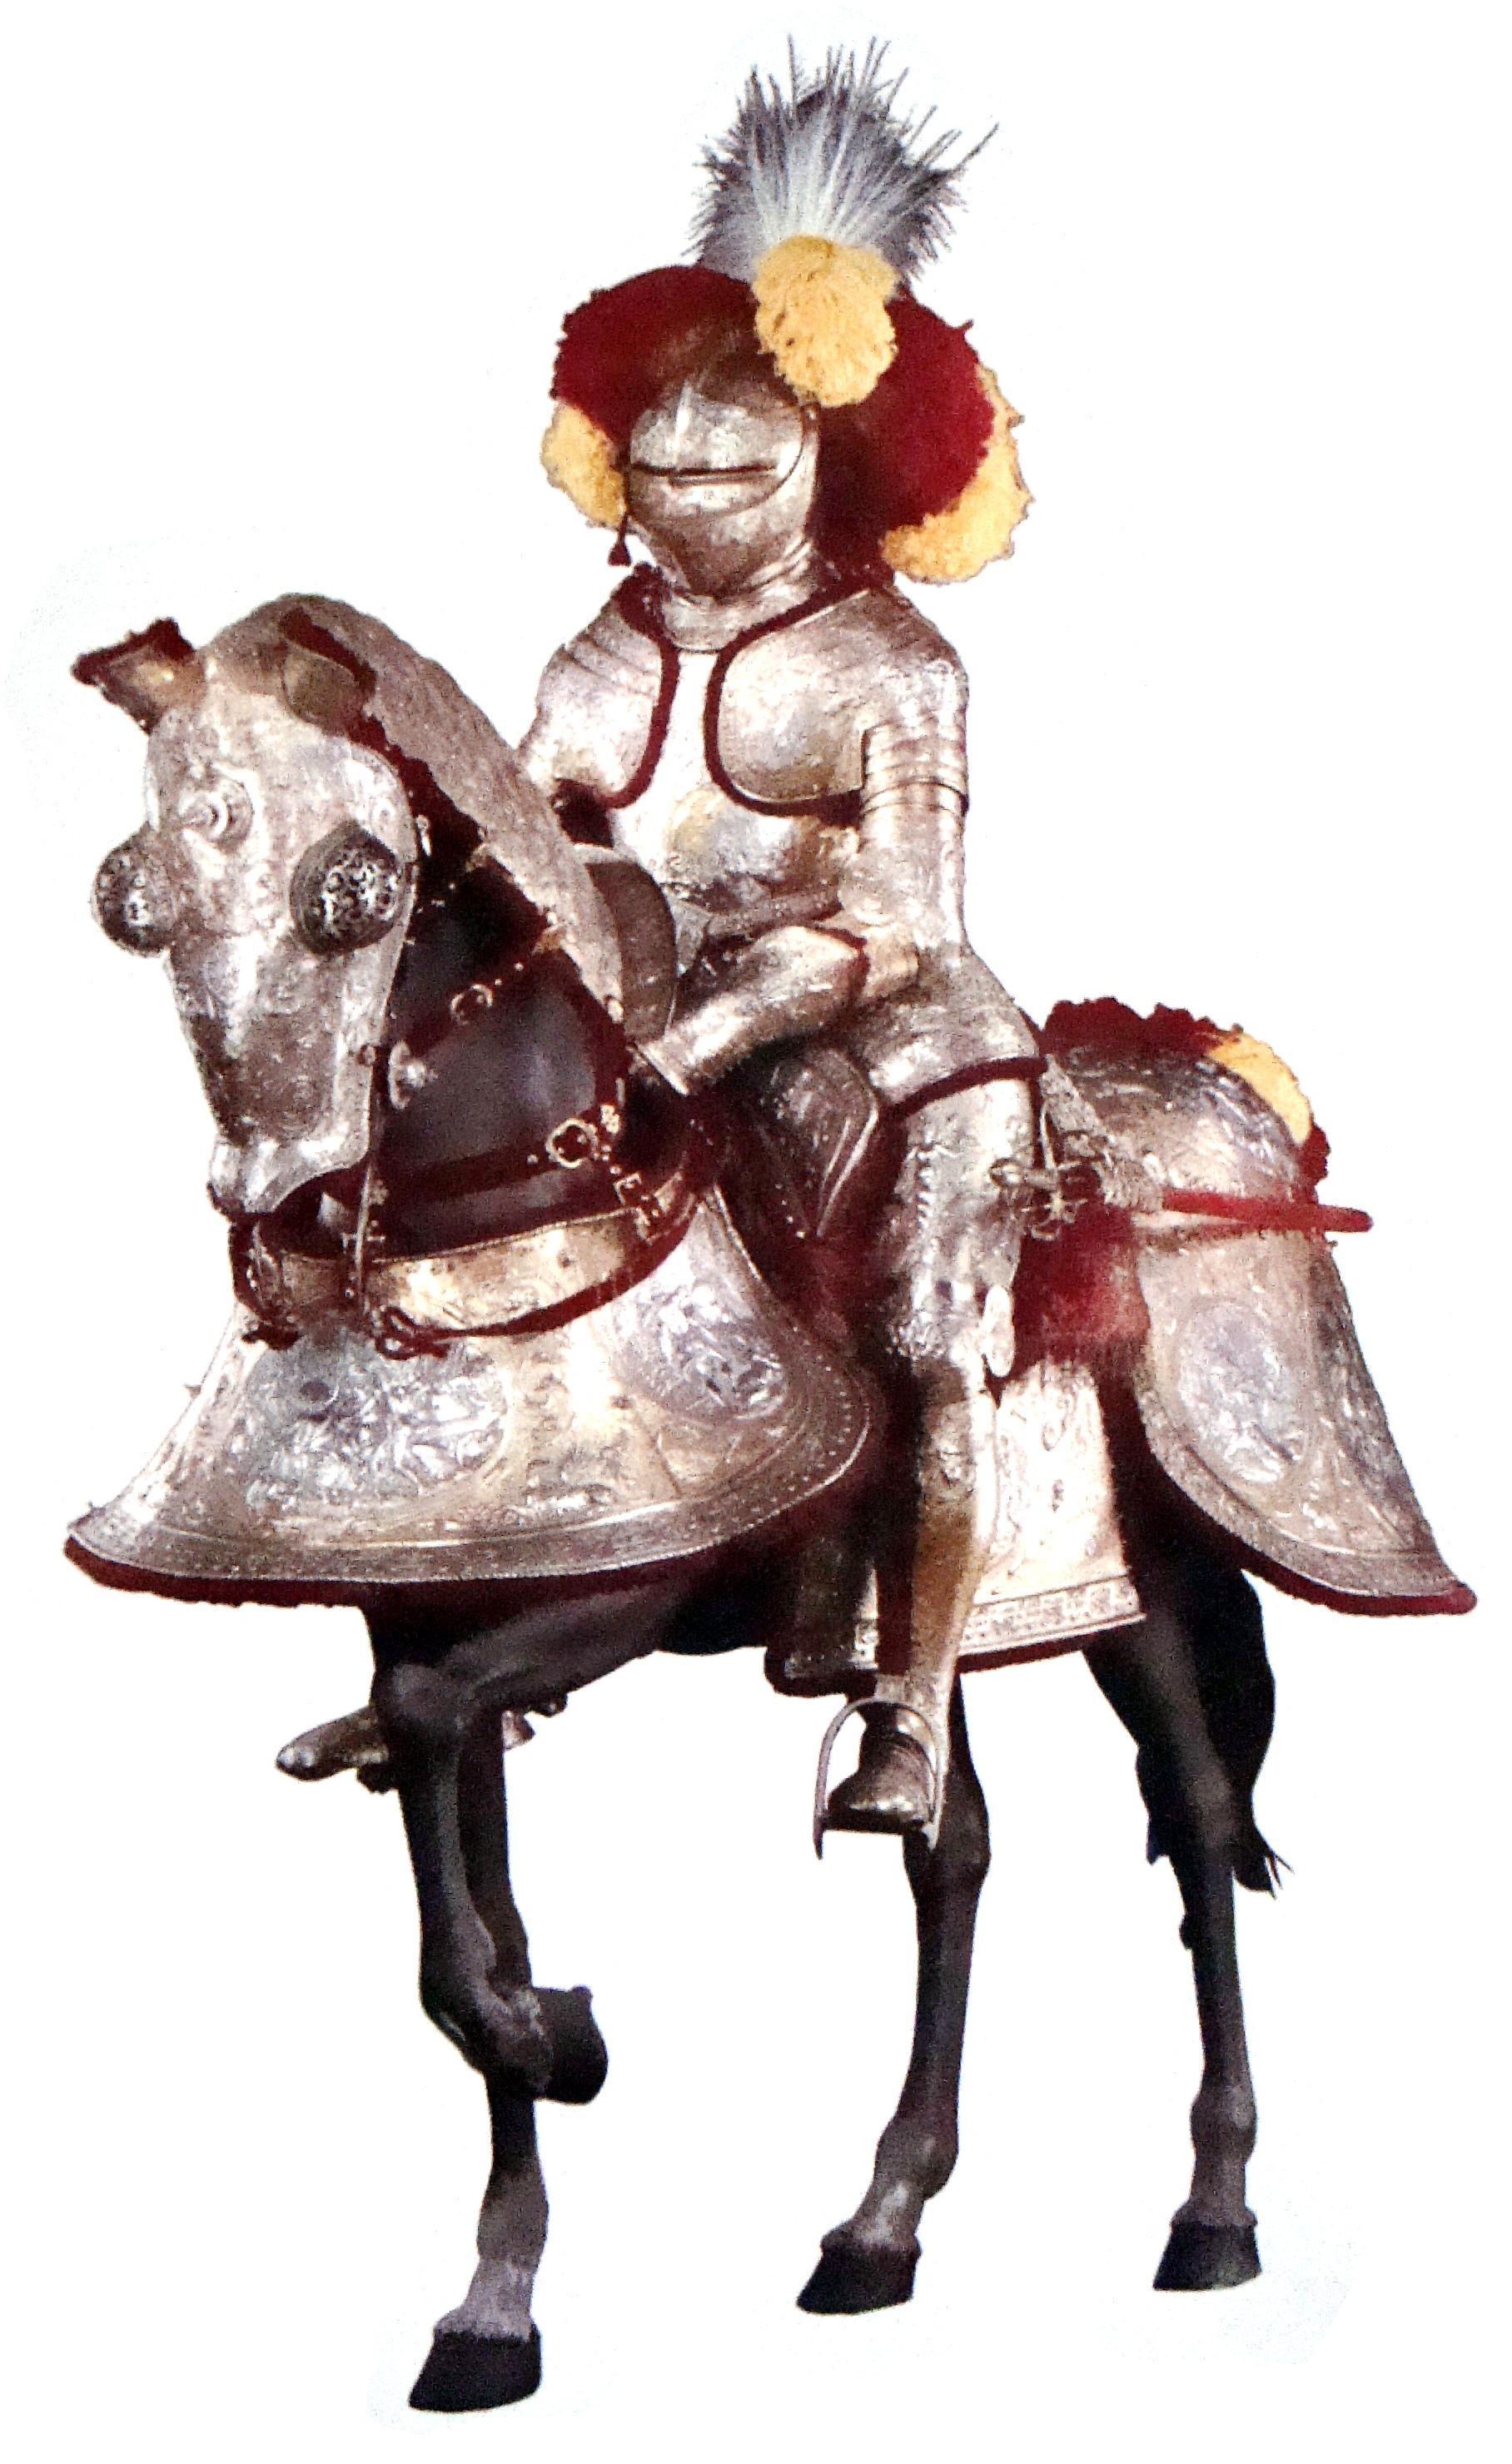 Depiction of Torneo medieval